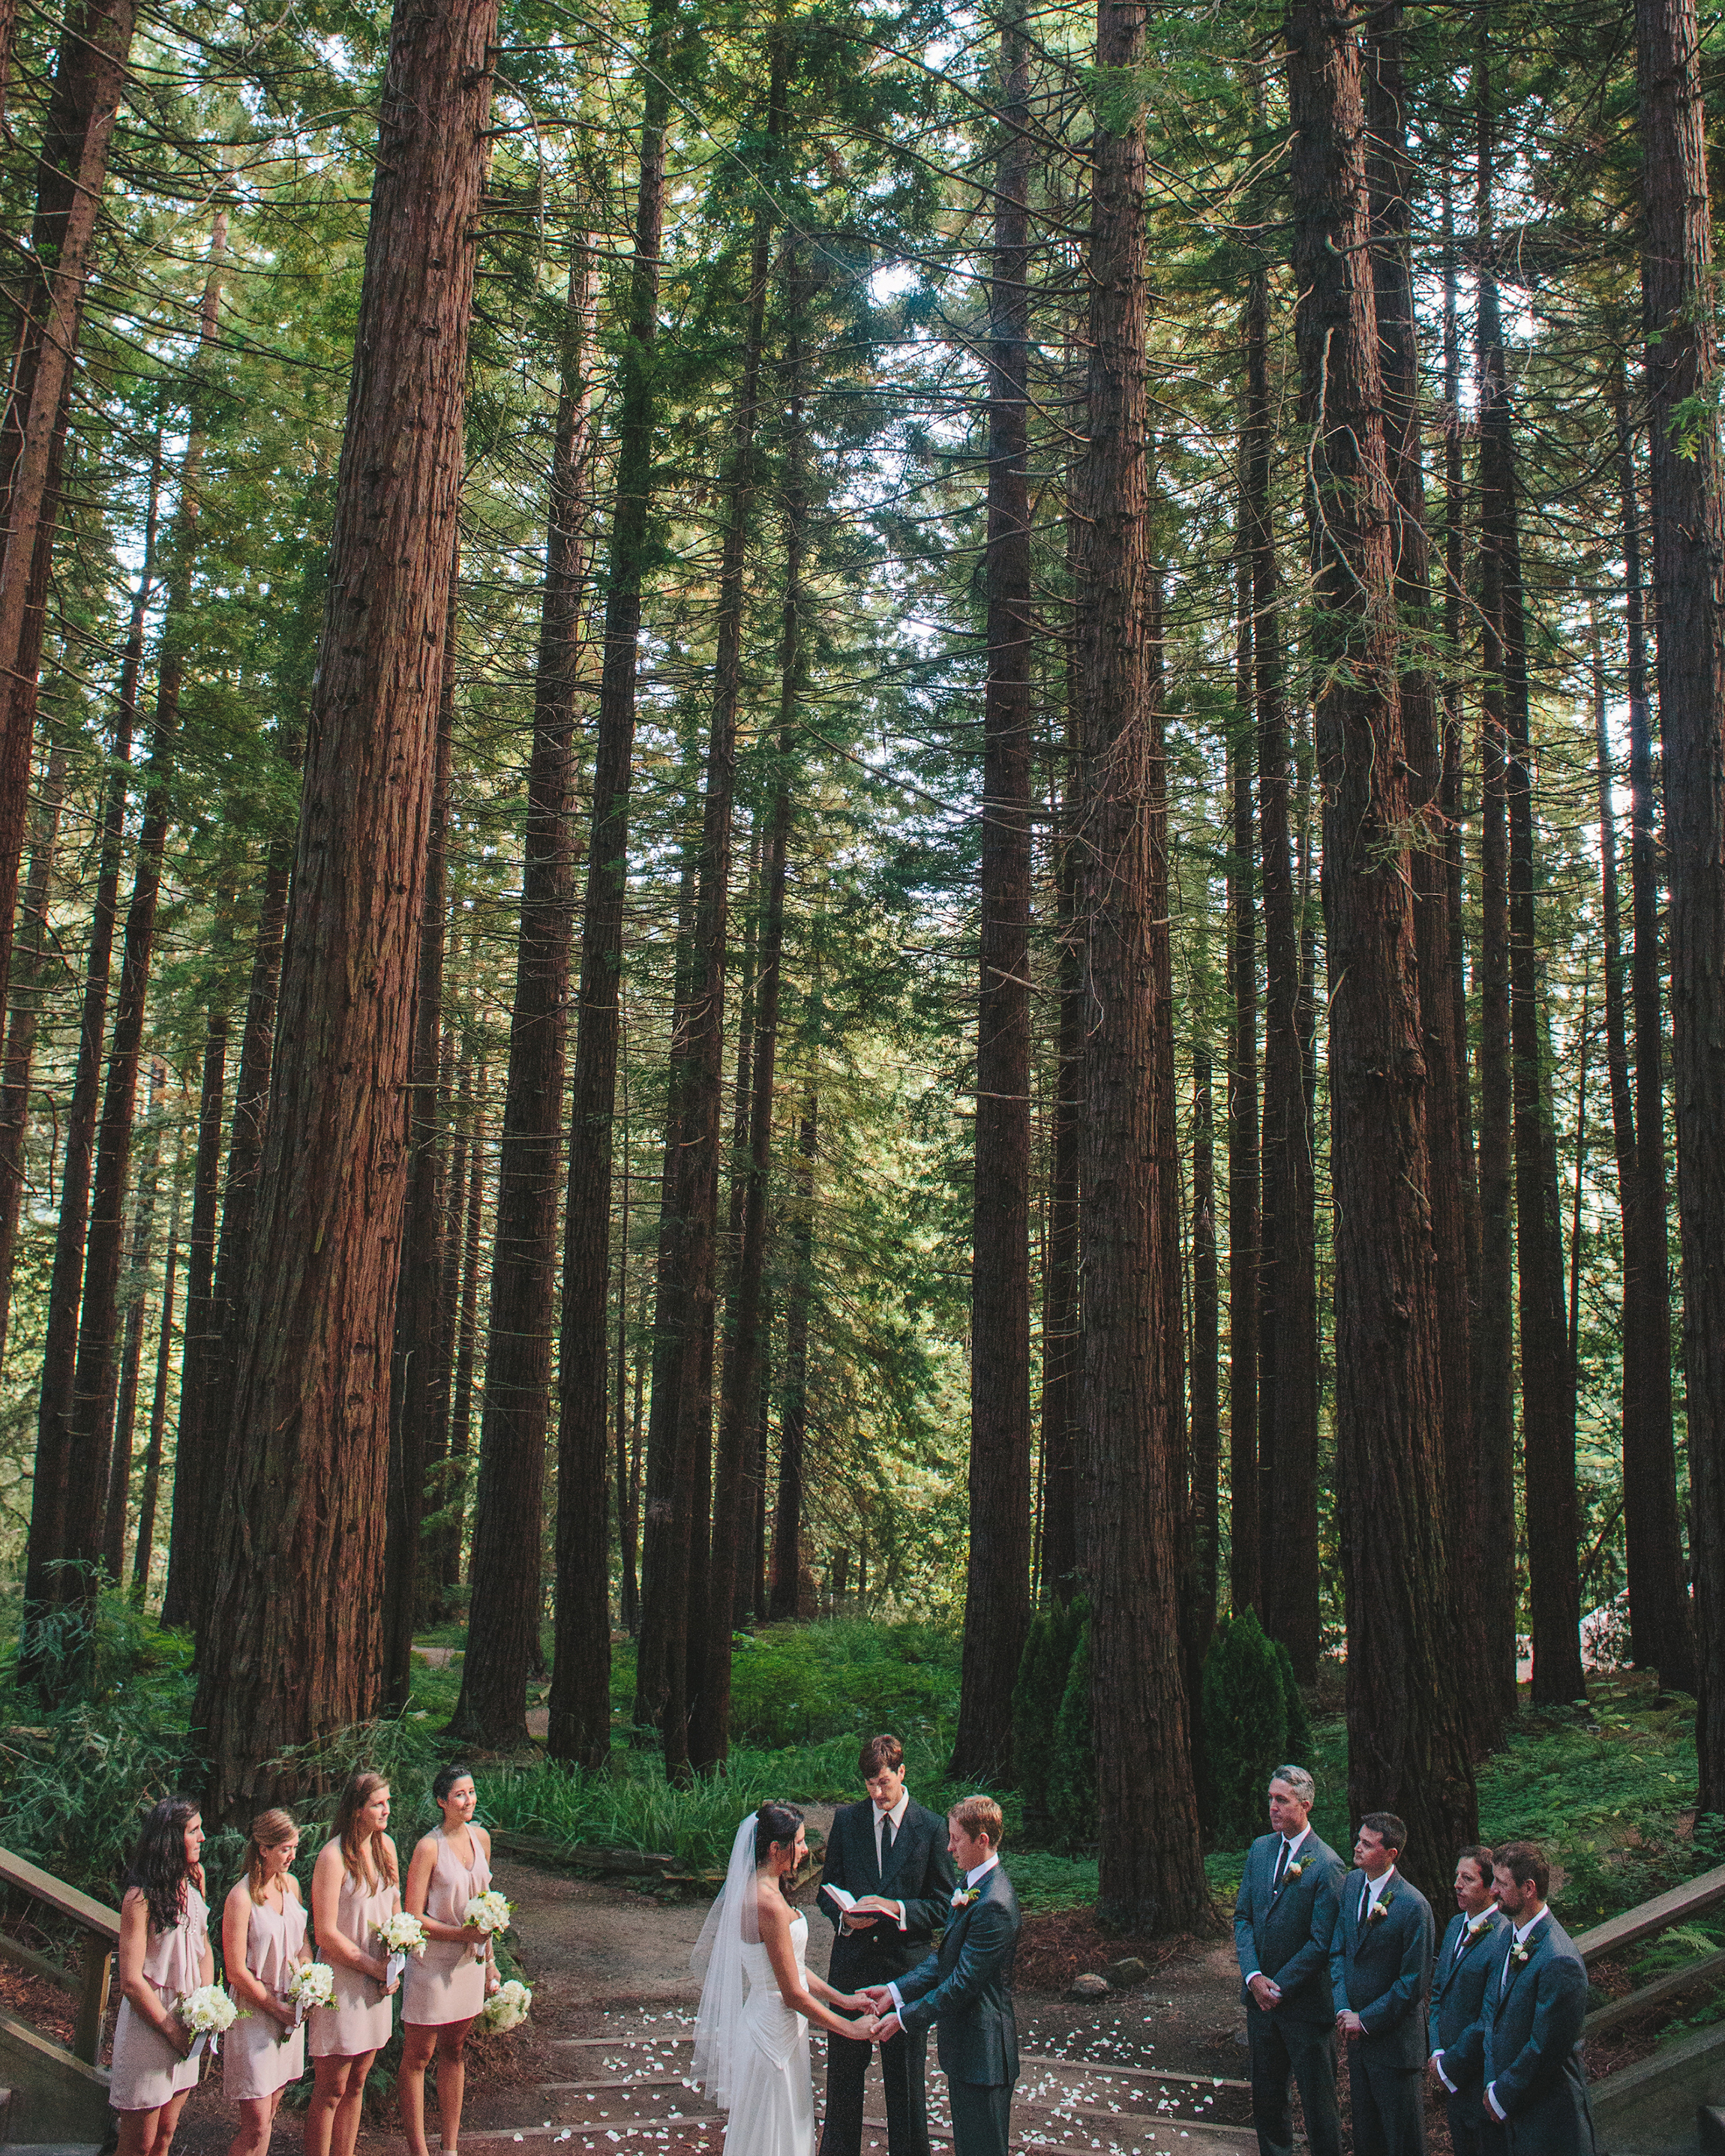 collegeweddingvenues-ucberkeley-0615.jpg